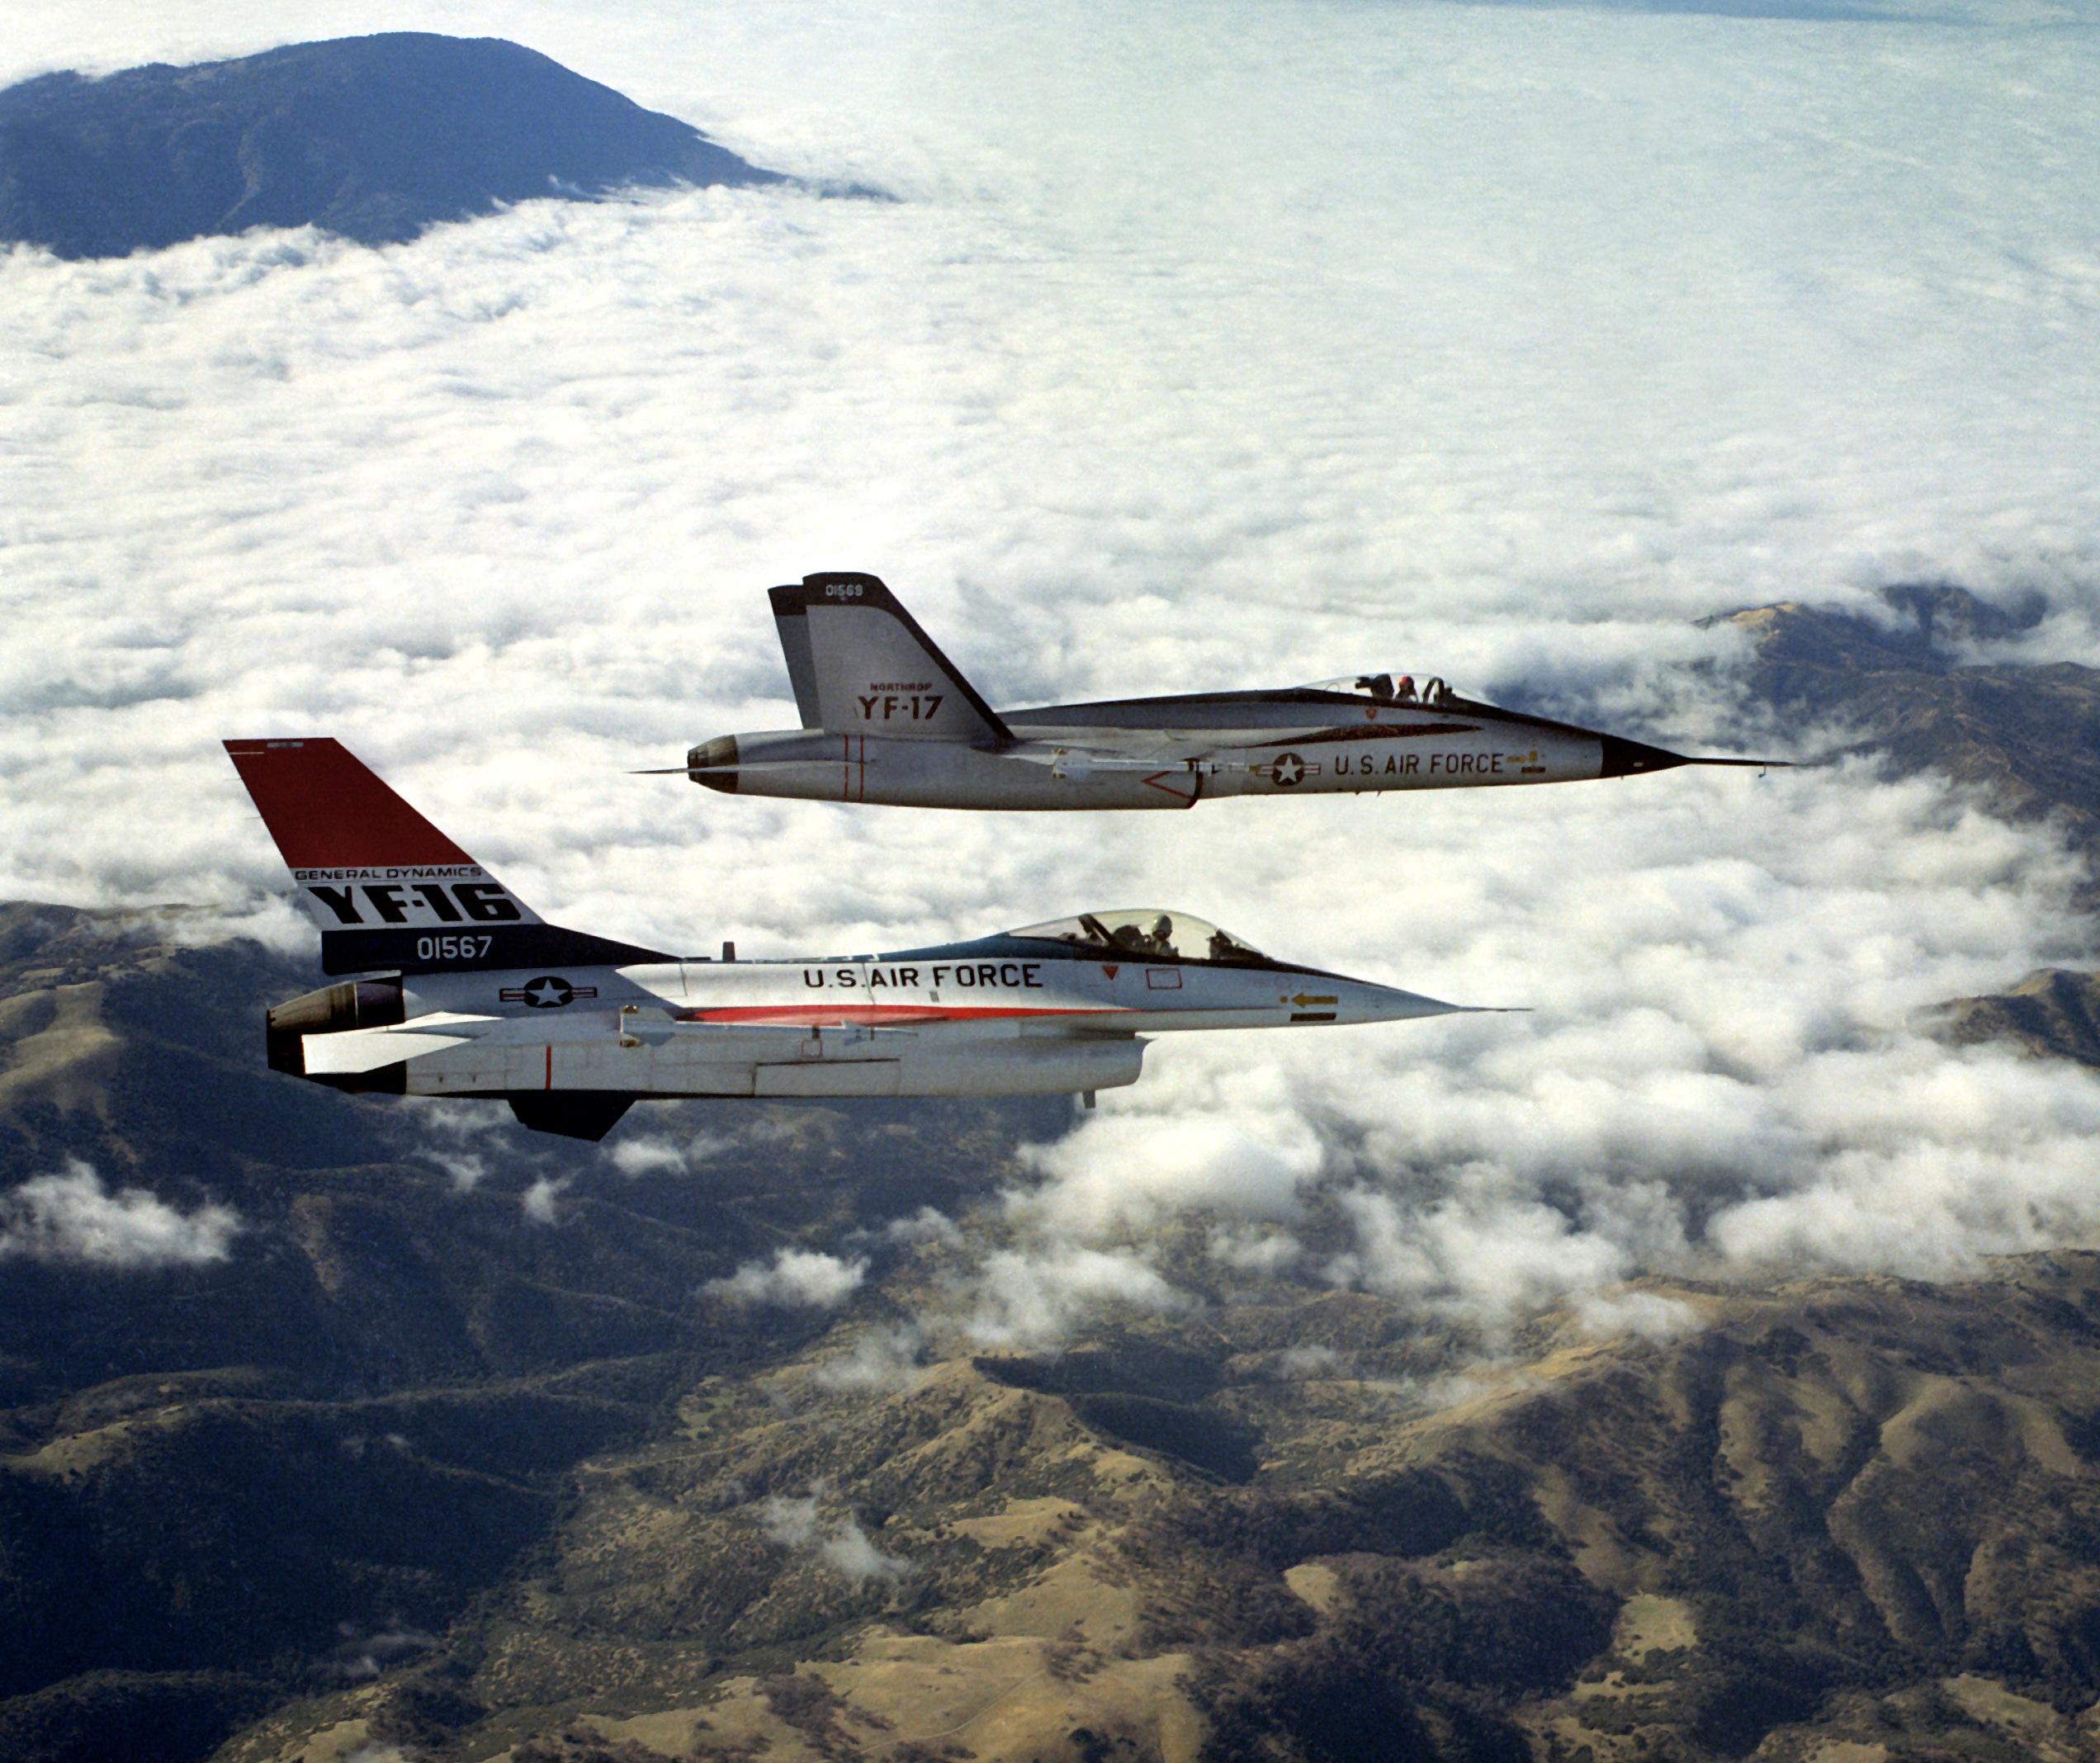 YF-16_and_YF-17_in_flight